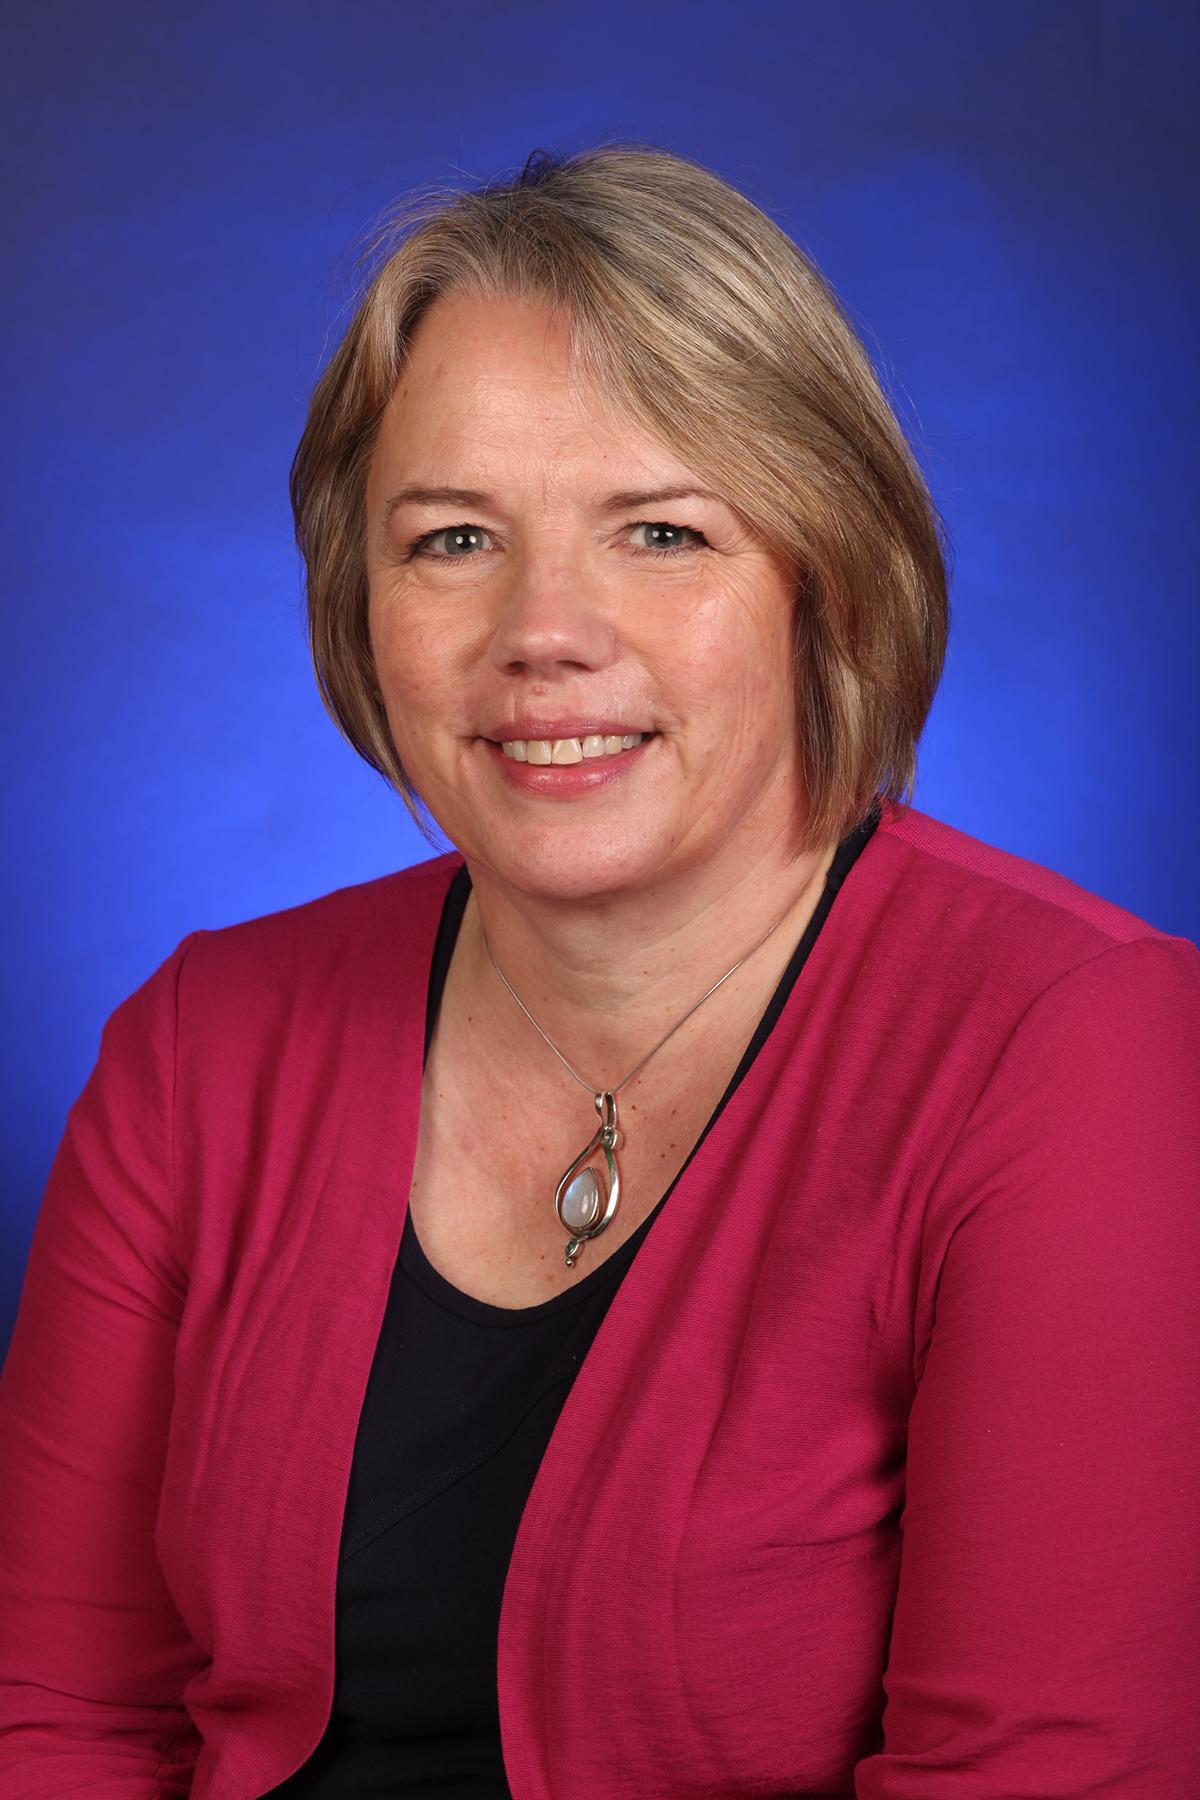 Sally Peters